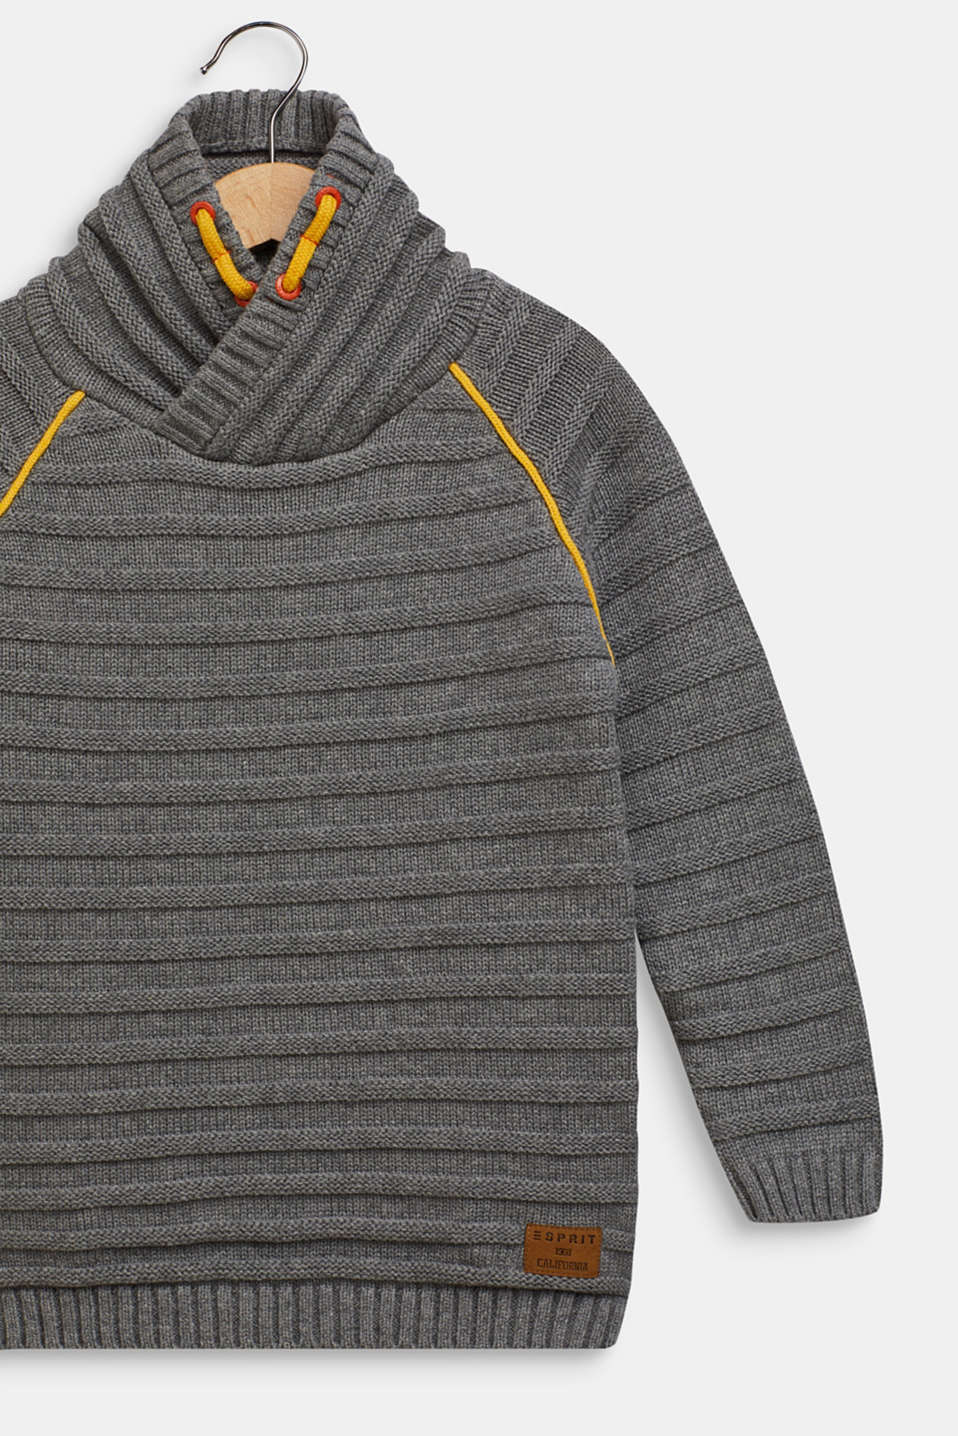 Ribbed shawl collar jumper, 100% cotton, DARK HEATHER G, detail image number 2